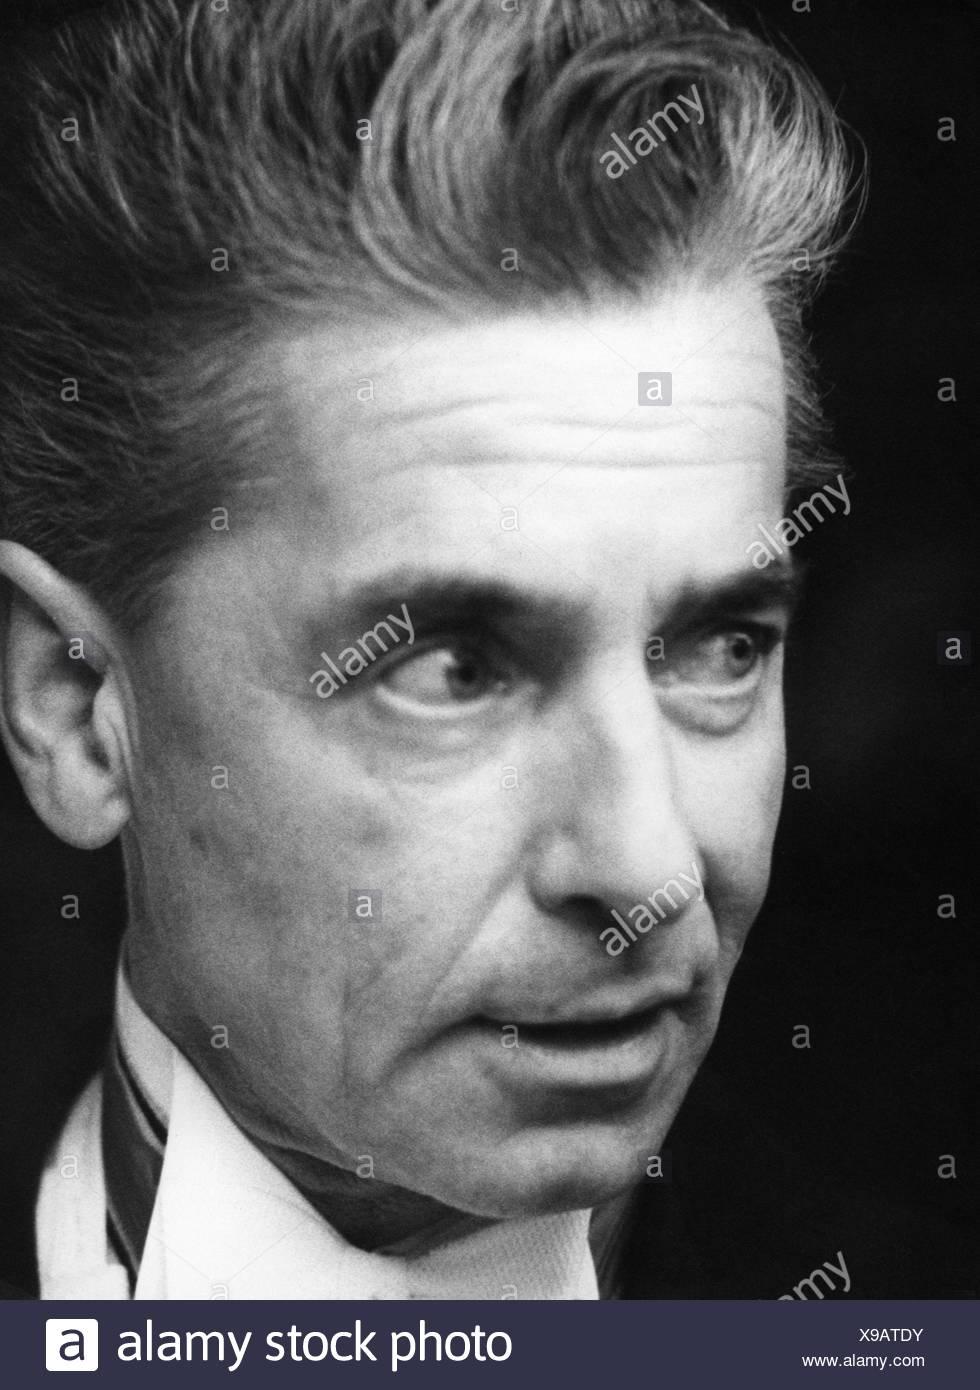 Karajan, Herbert von, 5.4.1908 - 16.7.1989, Austrian conductor, portrait, 1963, , Stock Photo